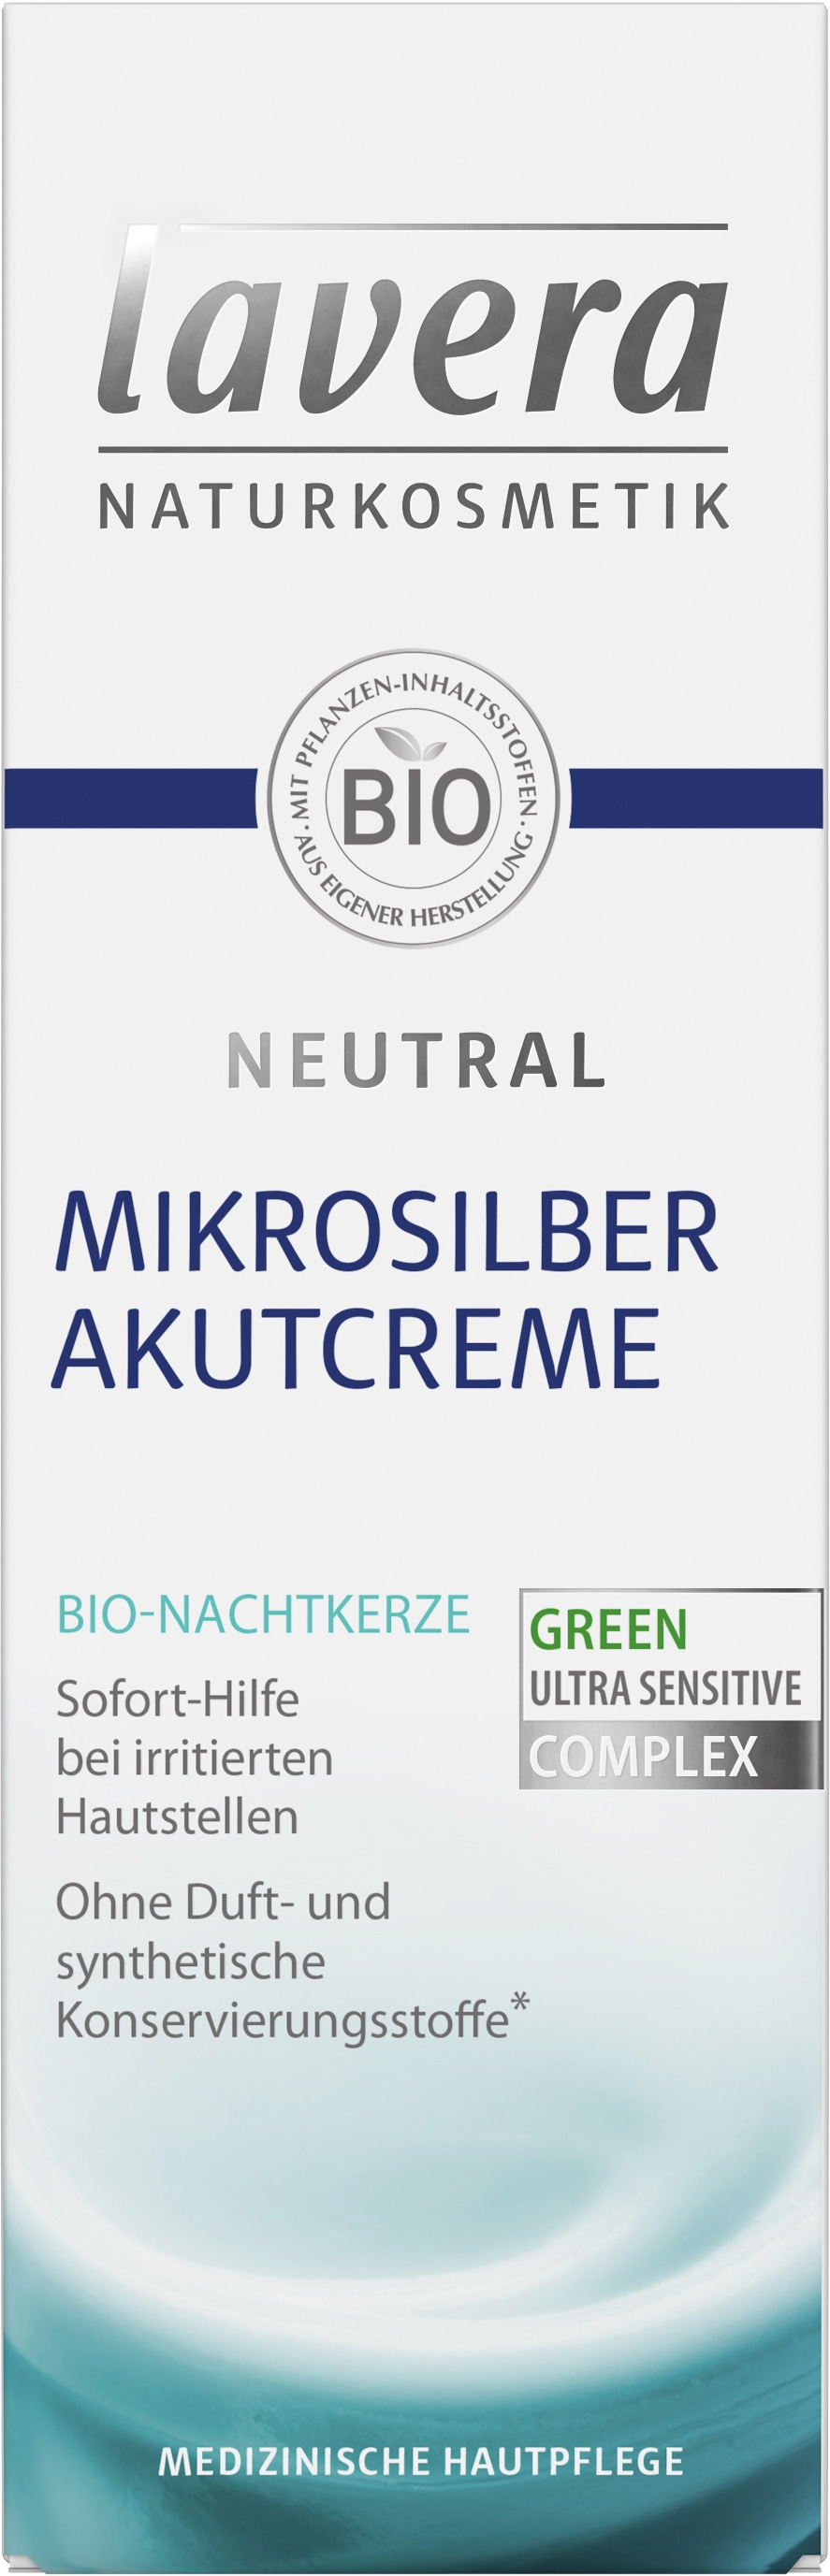 Neutral Mikrosilber Akutcreme